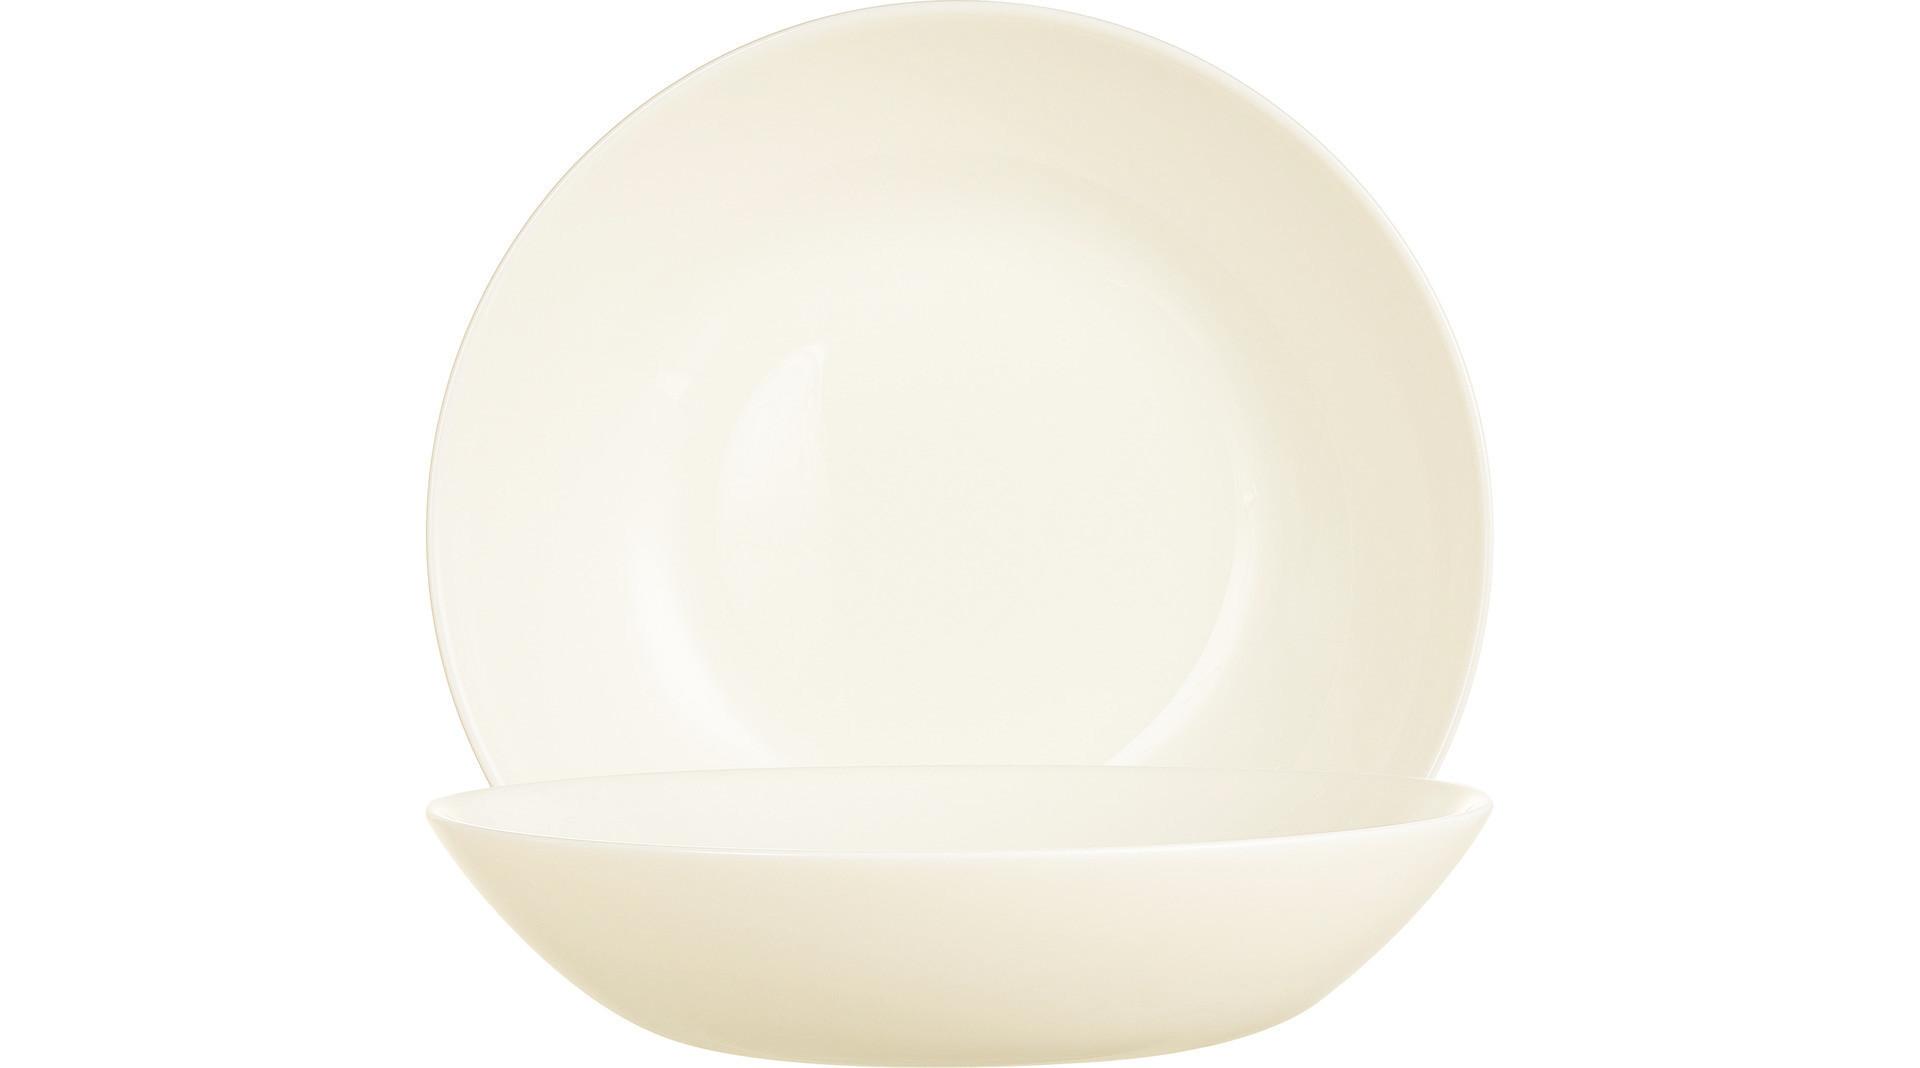 Intensity Cream, Coupteller tief ø 200 mm / 0,75 l